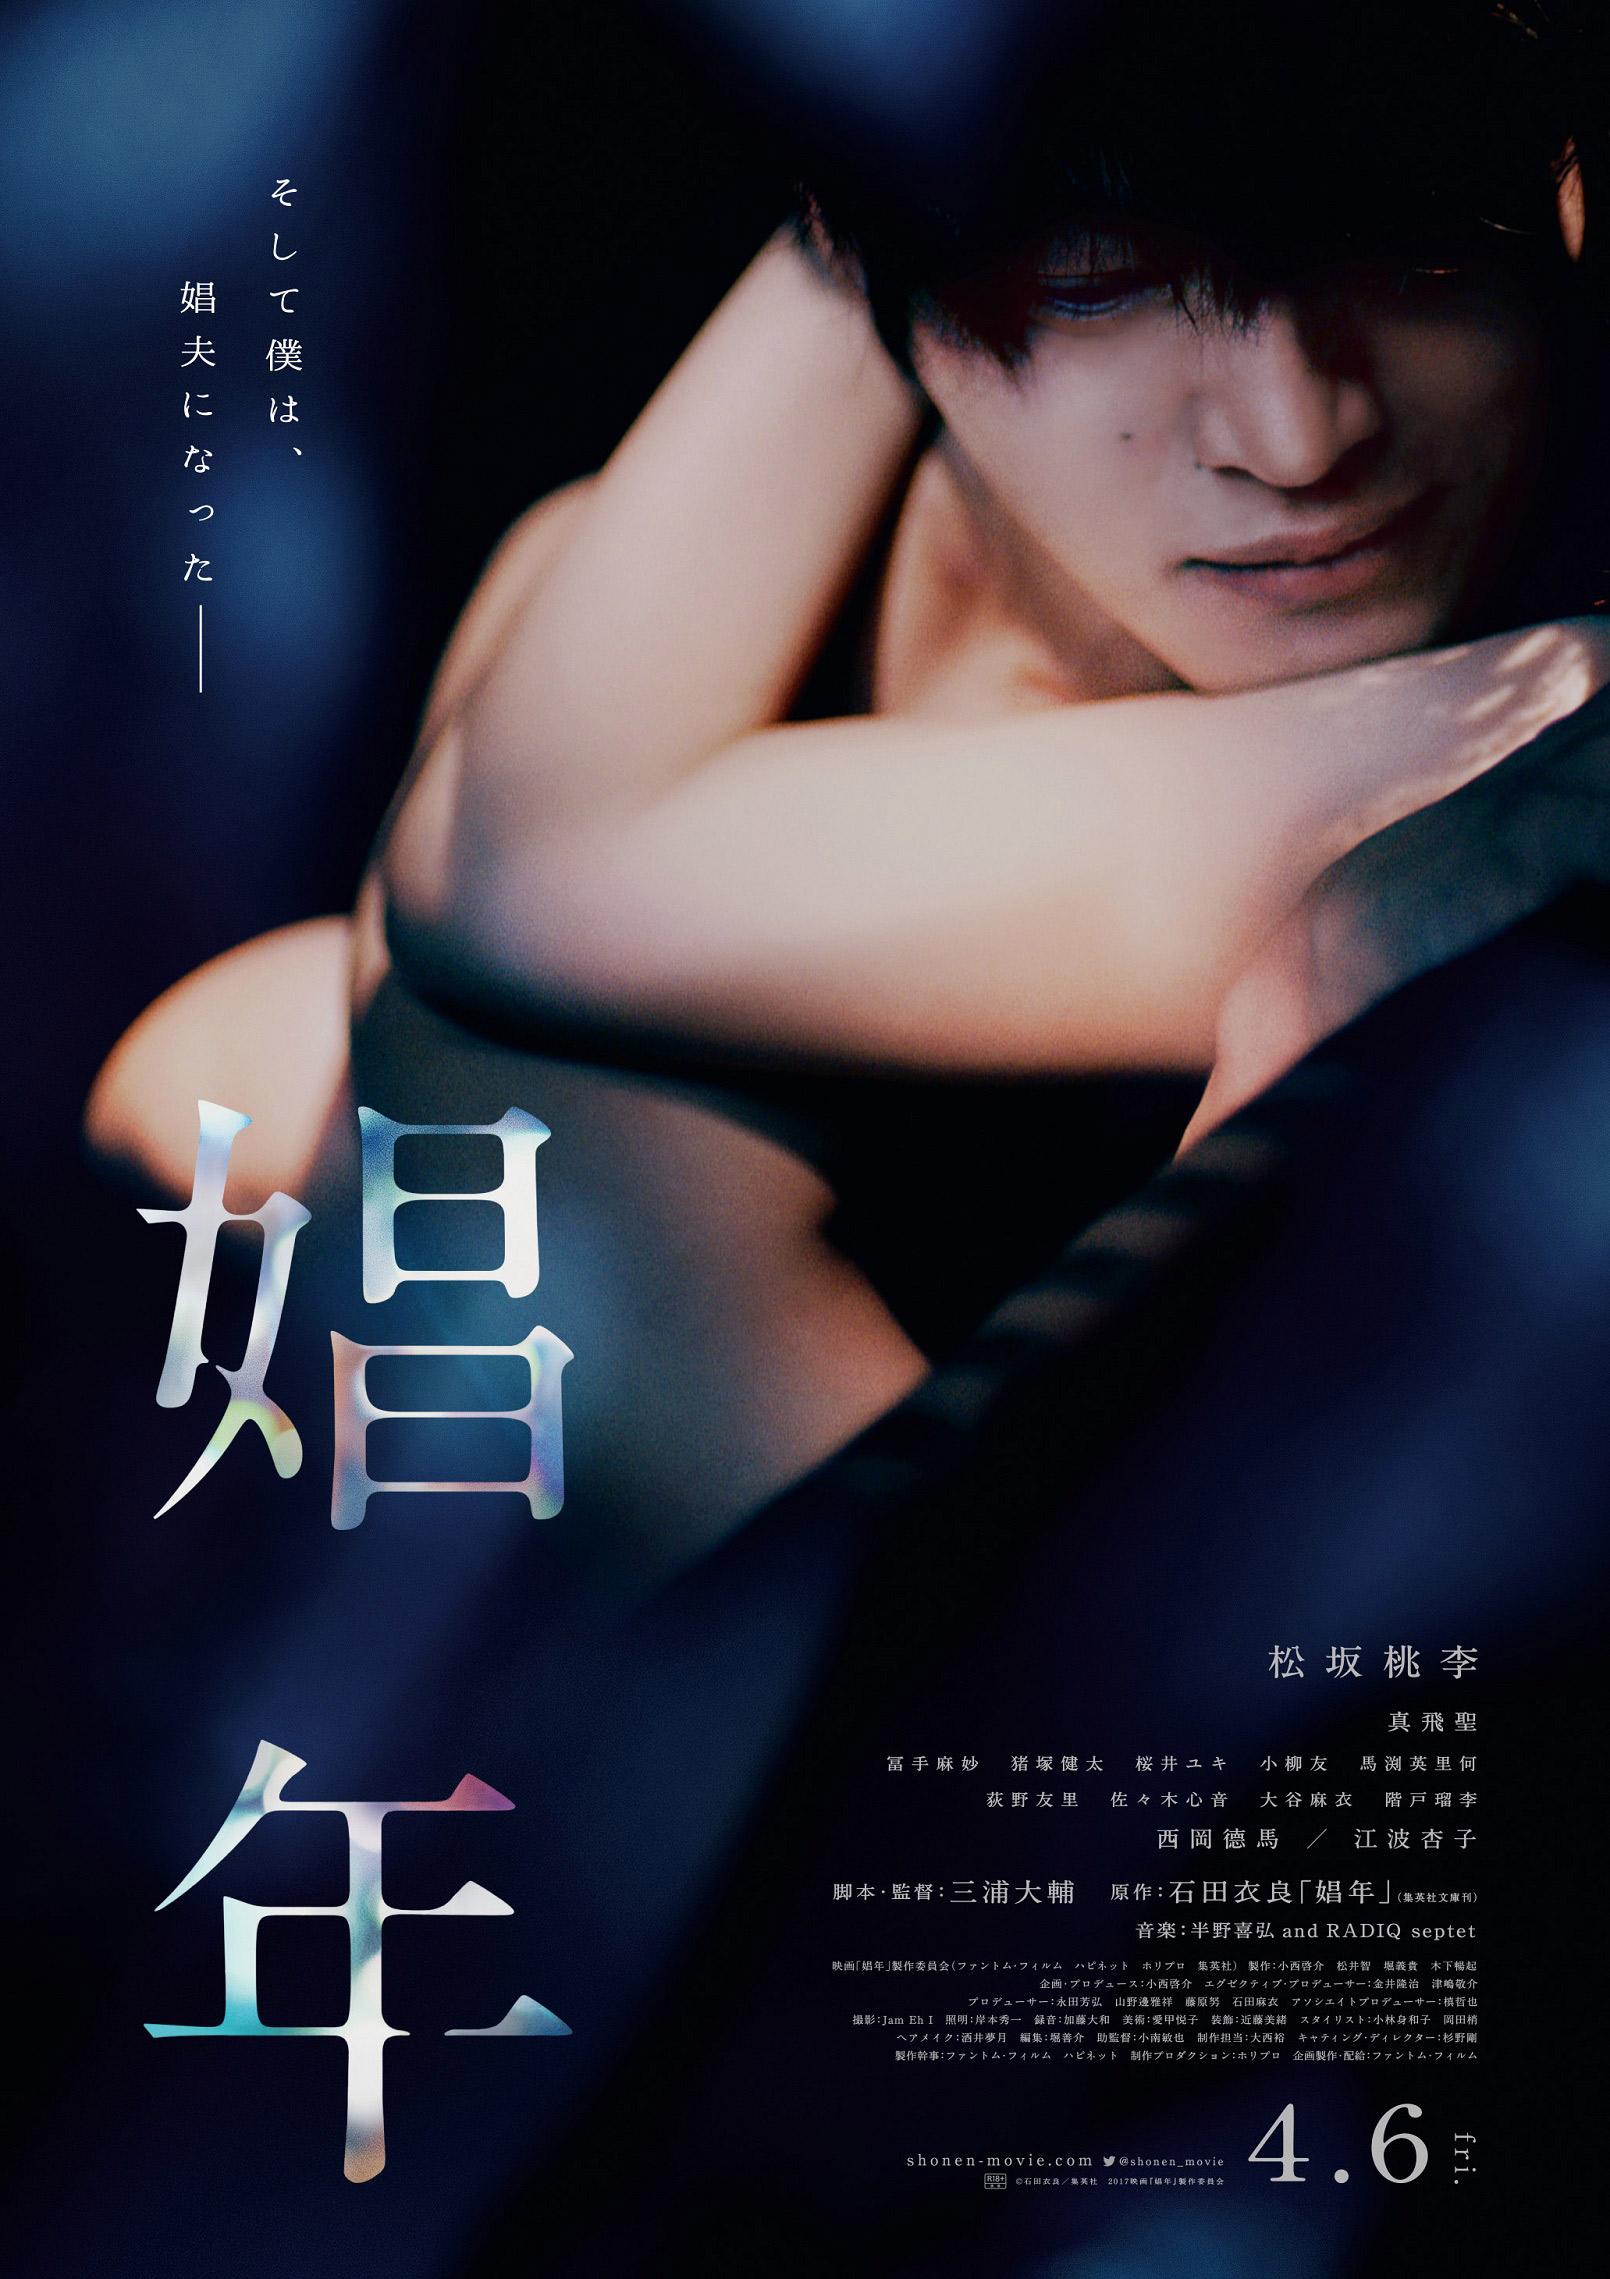 japanese gay escort tokyo